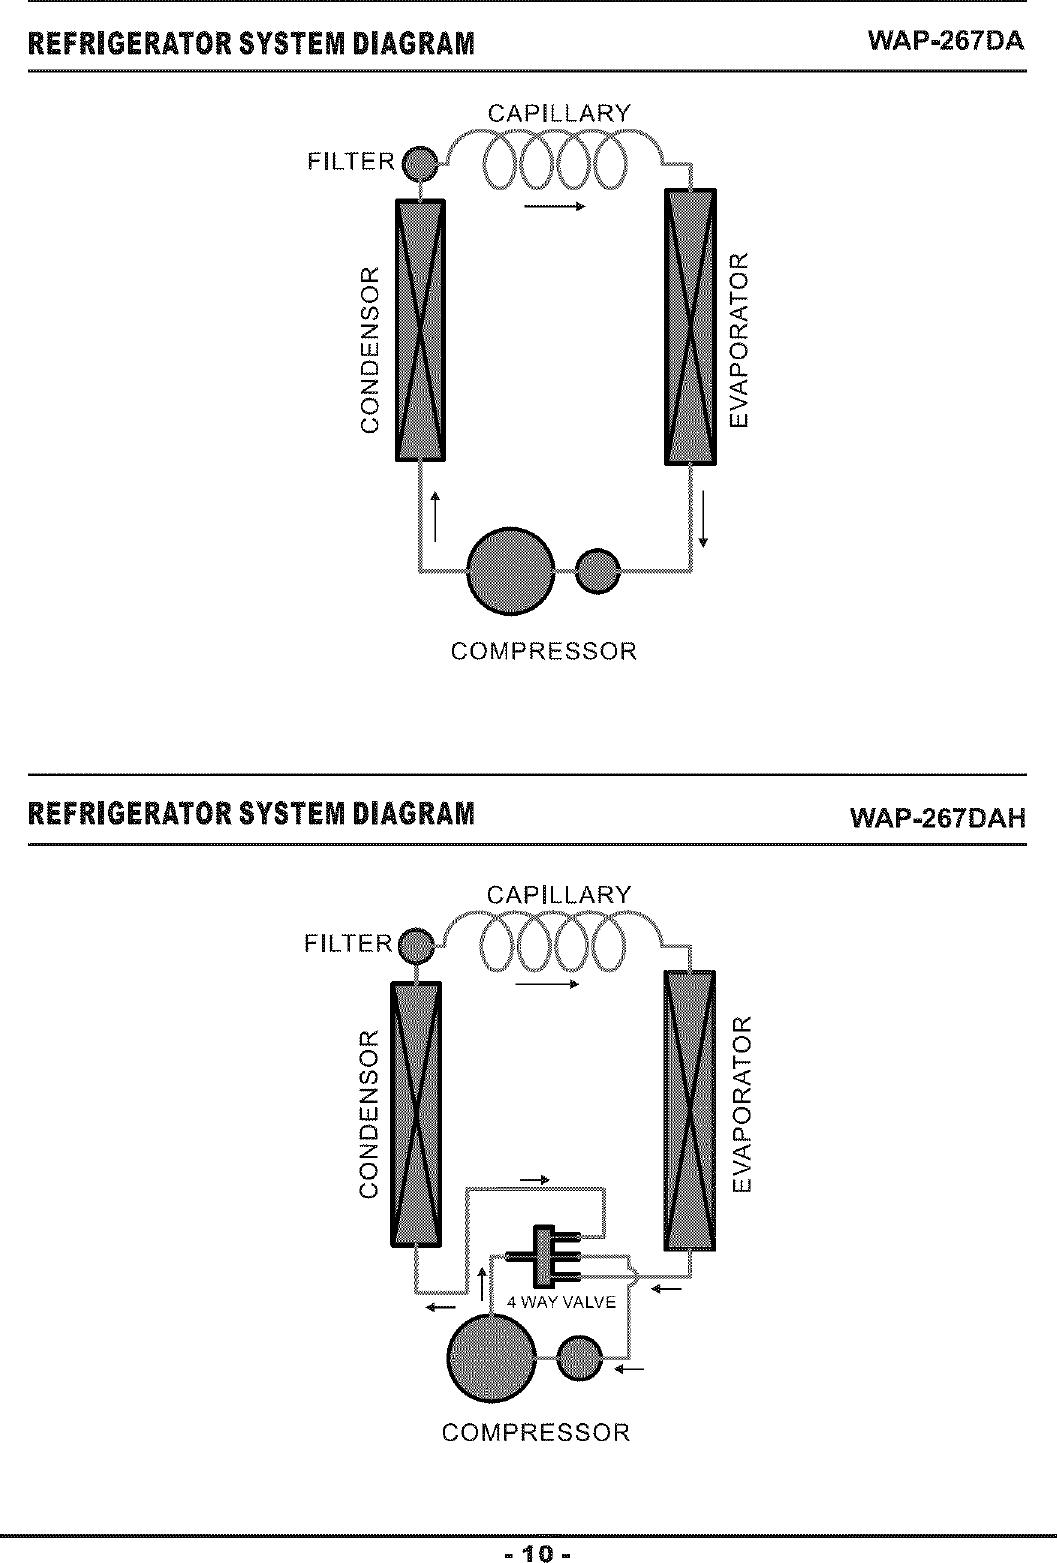 HAIER Air Conditioner Room (42) Manual L0807364 on braun wiring diagram, crosley wiring diagram, broan wiring diagram, toshiba wiring diagram, vivitar wiring diagram, sears wiring diagram, manufacturing wiring diagram, viking wiring diagram, panasonic wiring diagram, o2 wiring diagram, apc wiring diagram, midea wiring diagram, apple wiring diagram, danby wiring diagram, foscam wiring diagram, msi wiring diagram, roper wiring diagram, dcs wiring diagram, benq wiring diagram, estate wiring diagram,